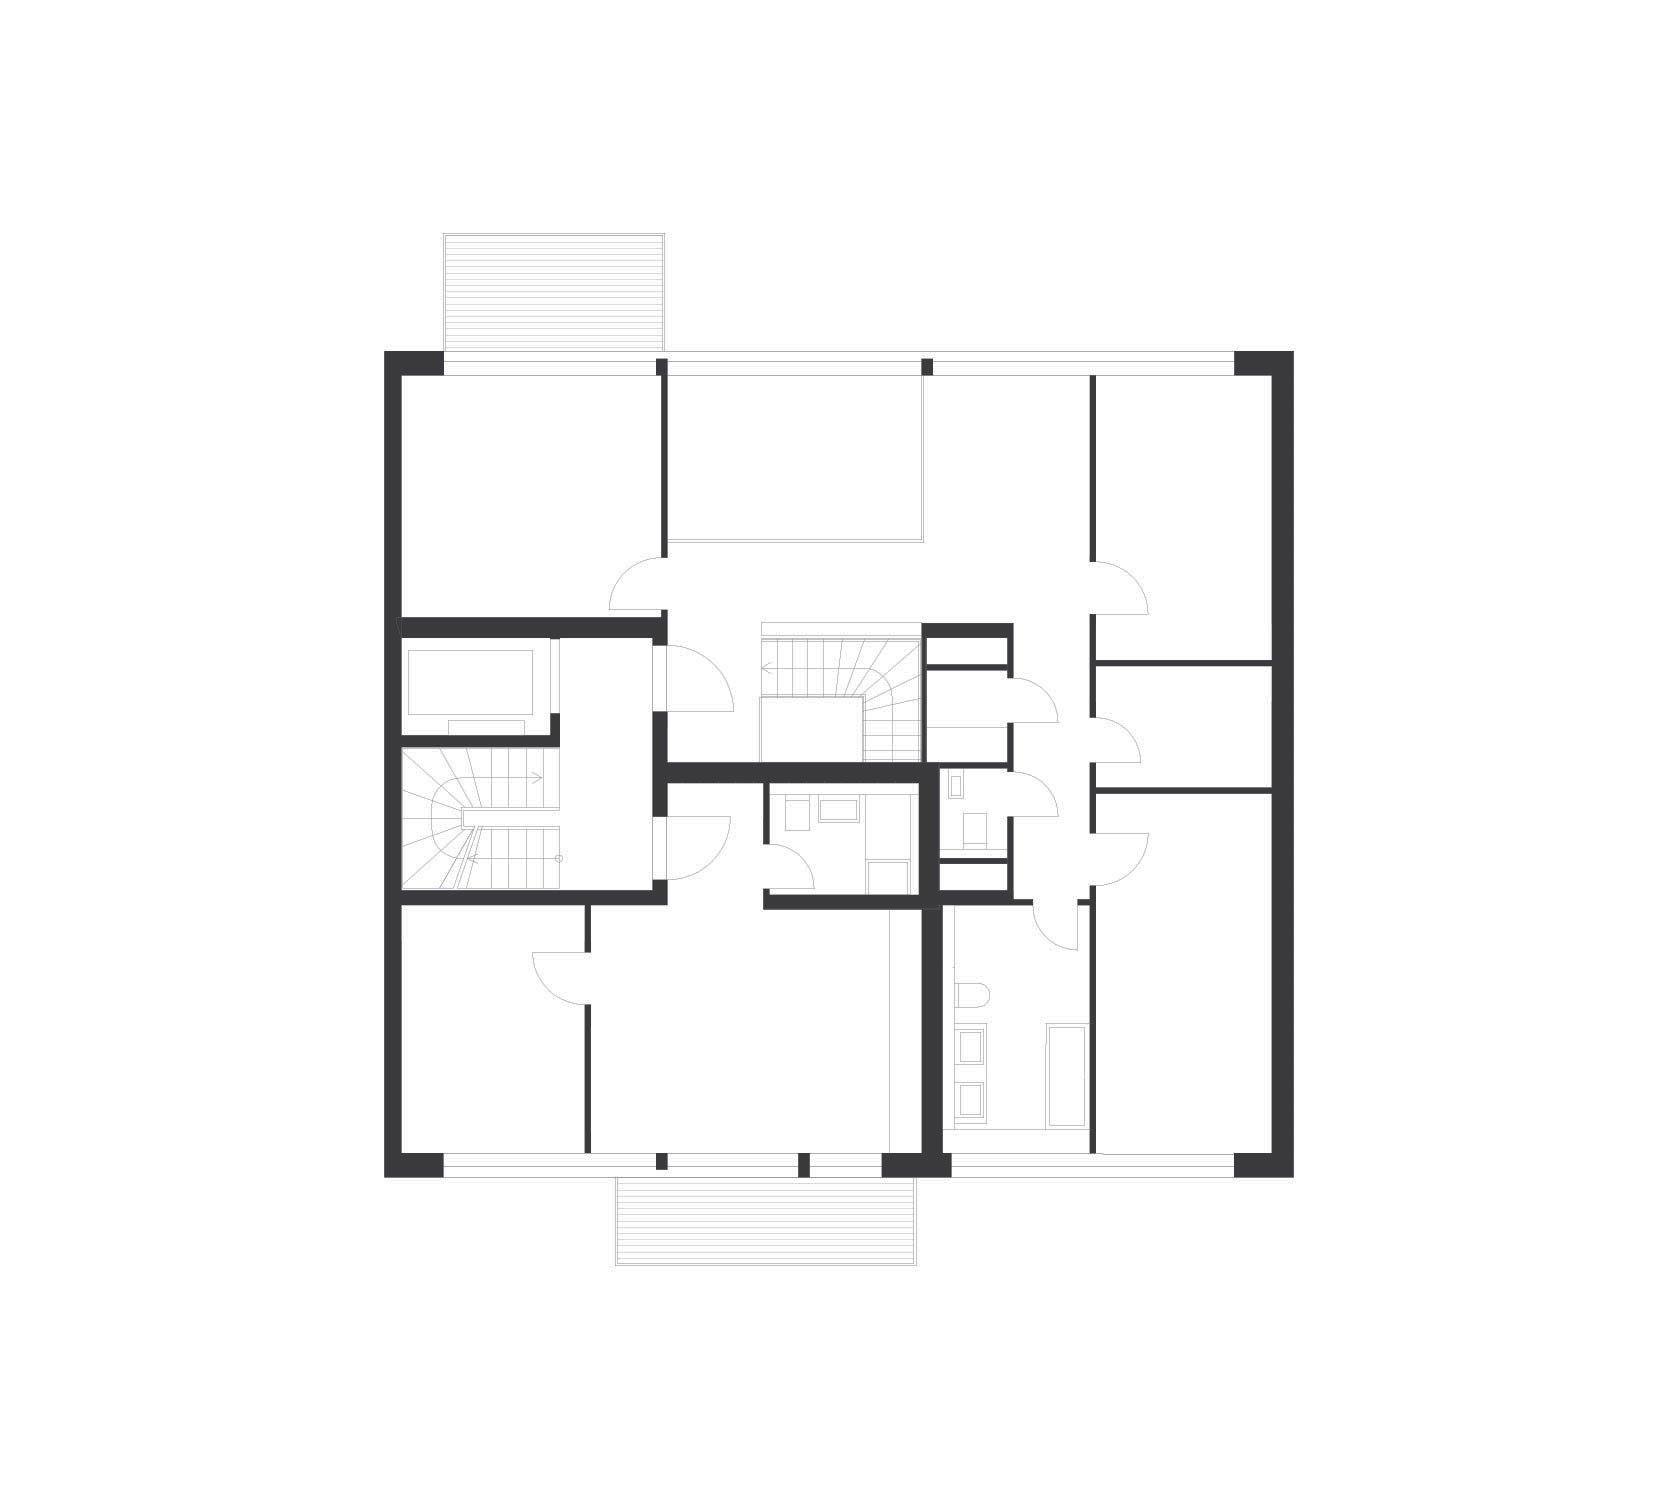 baugruppenhaus b26 in berlin mitte brandschutz wohnbauten baunetz wissen. Black Bedroom Furniture Sets. Home Design Ideas